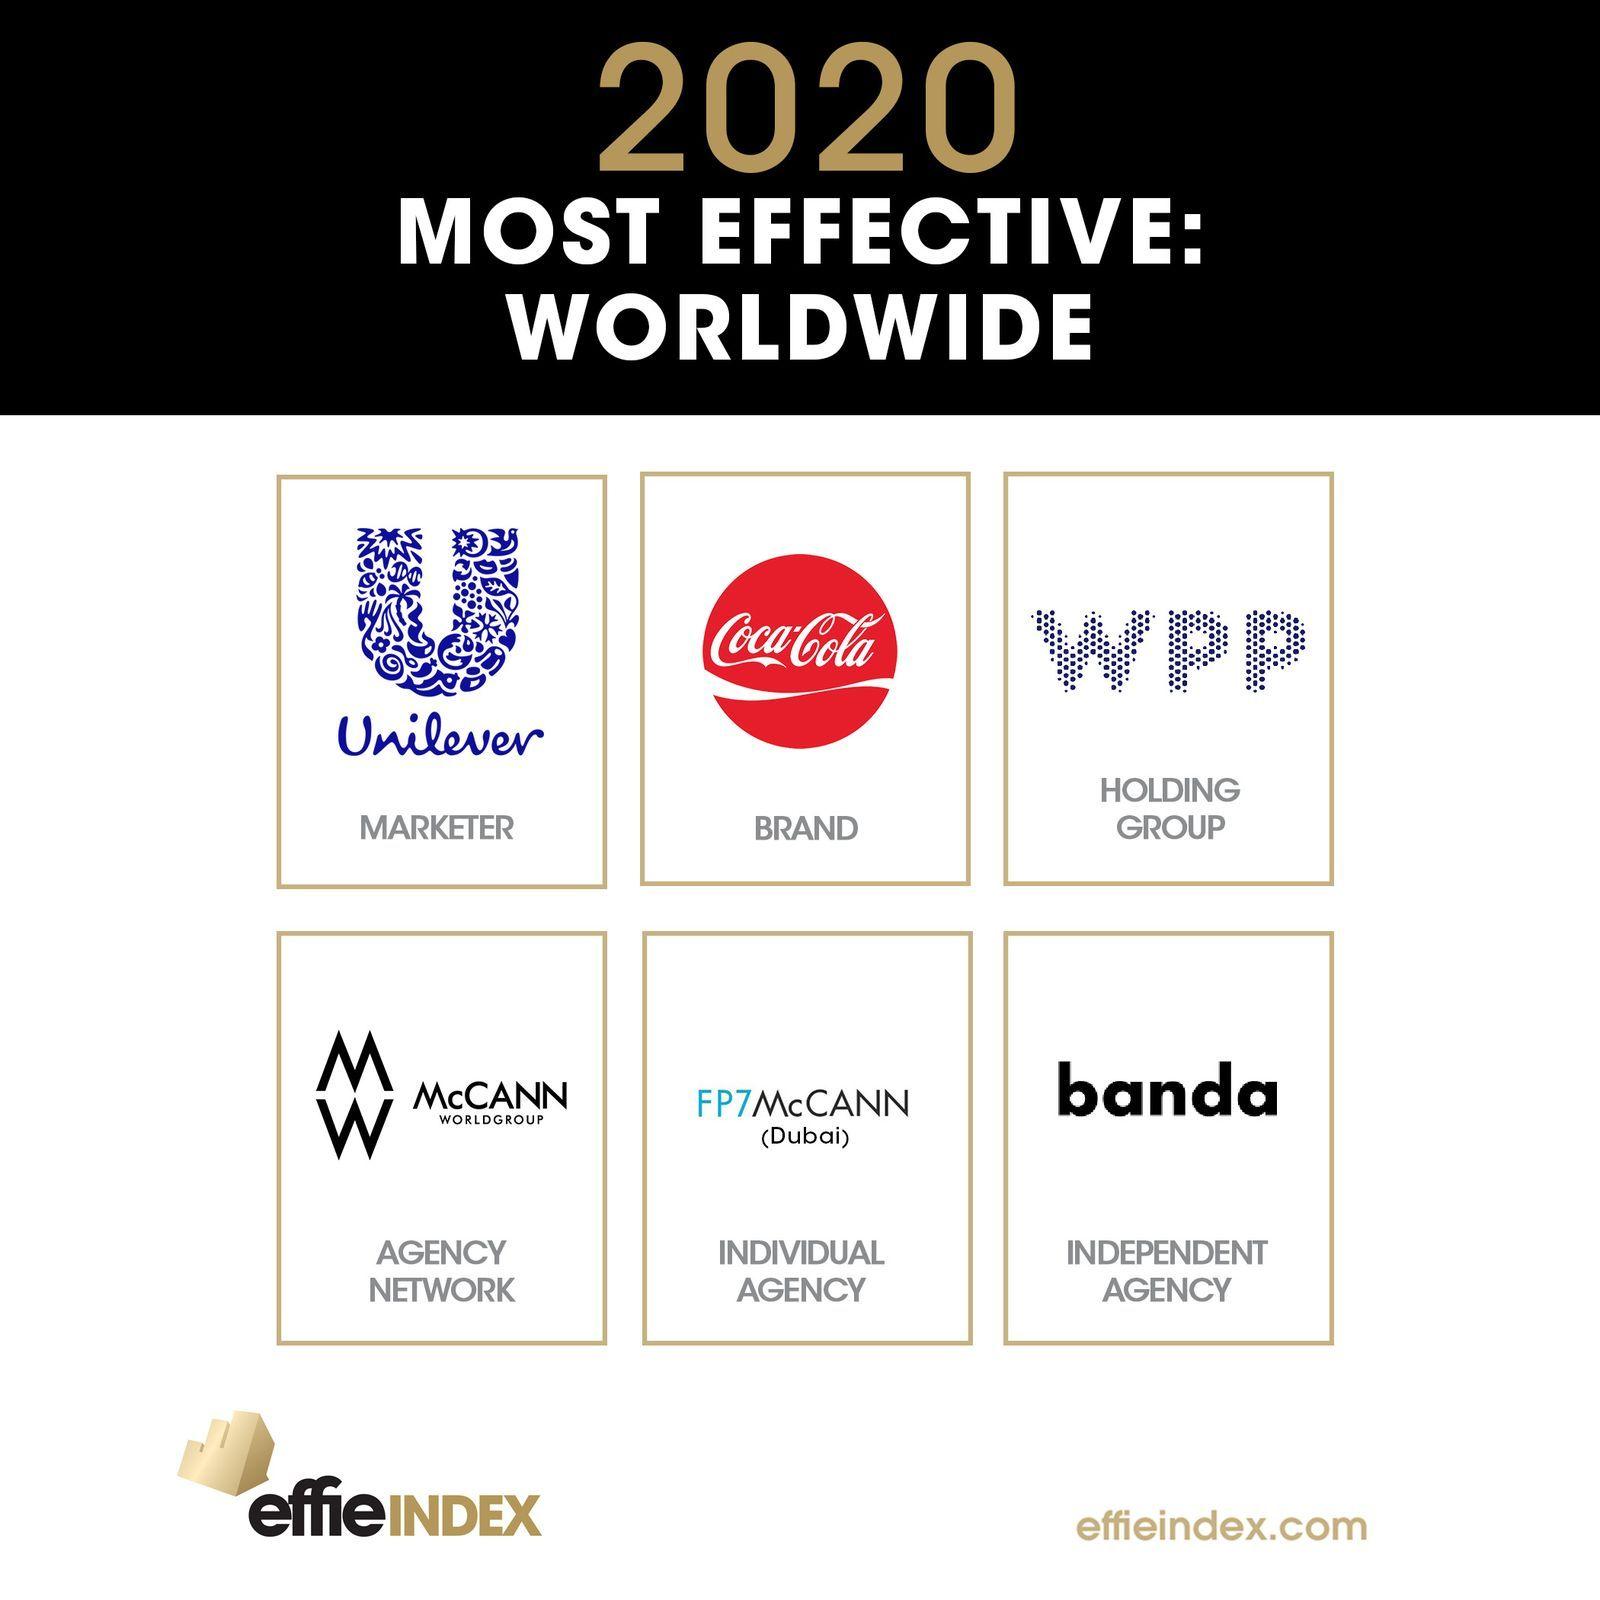 Трейси Алфорд, President & CEO Effie Worldwide